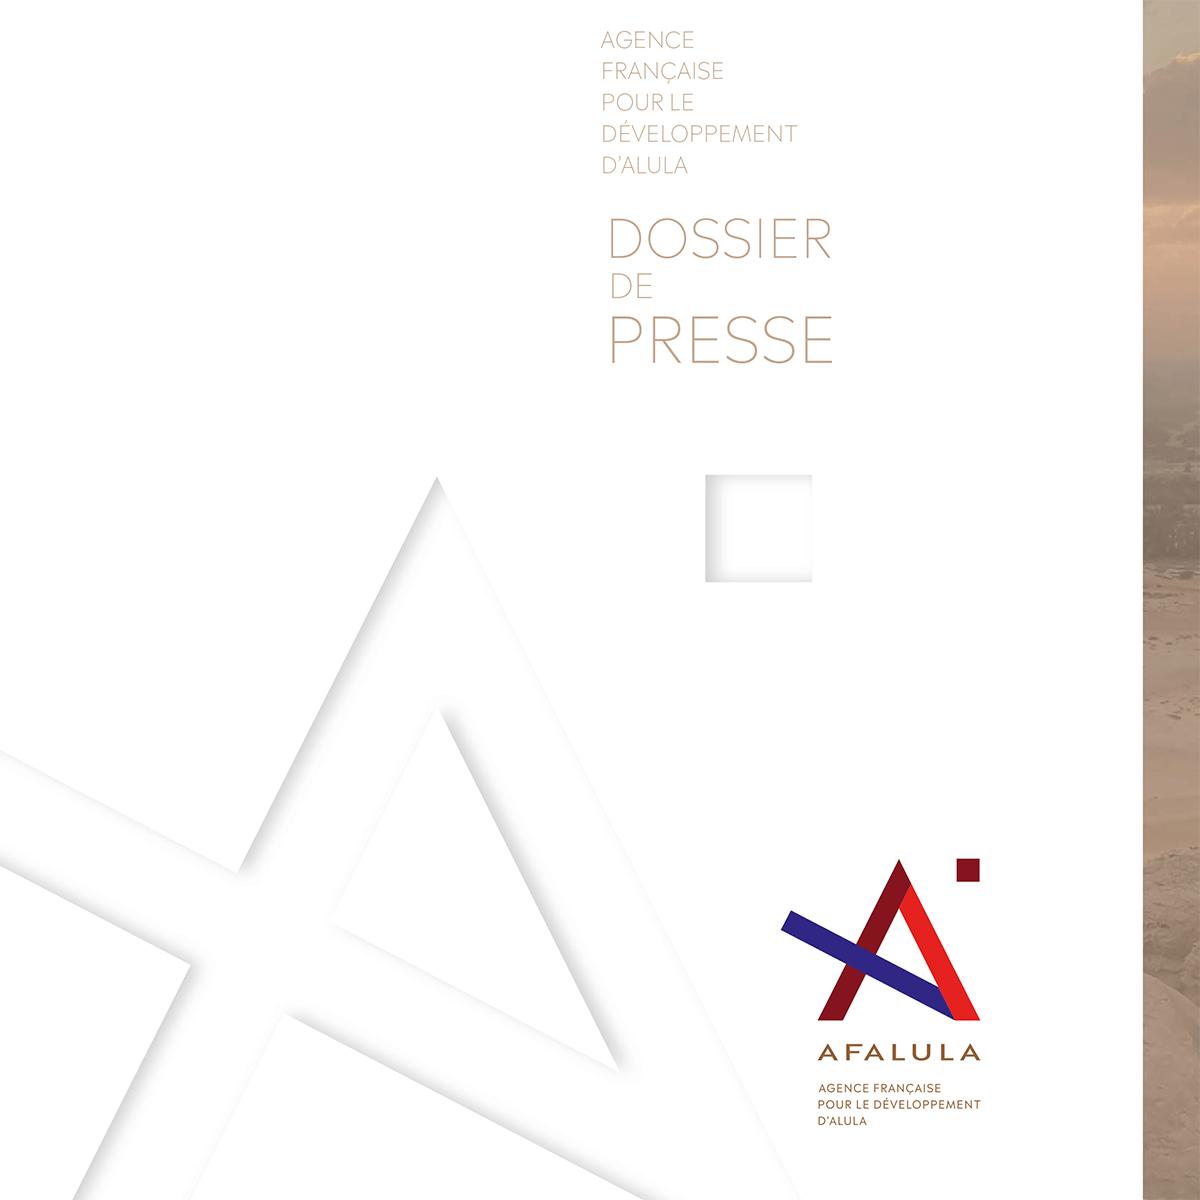 AFALULA_DOSSIER_DE_PRESSE_FR_square